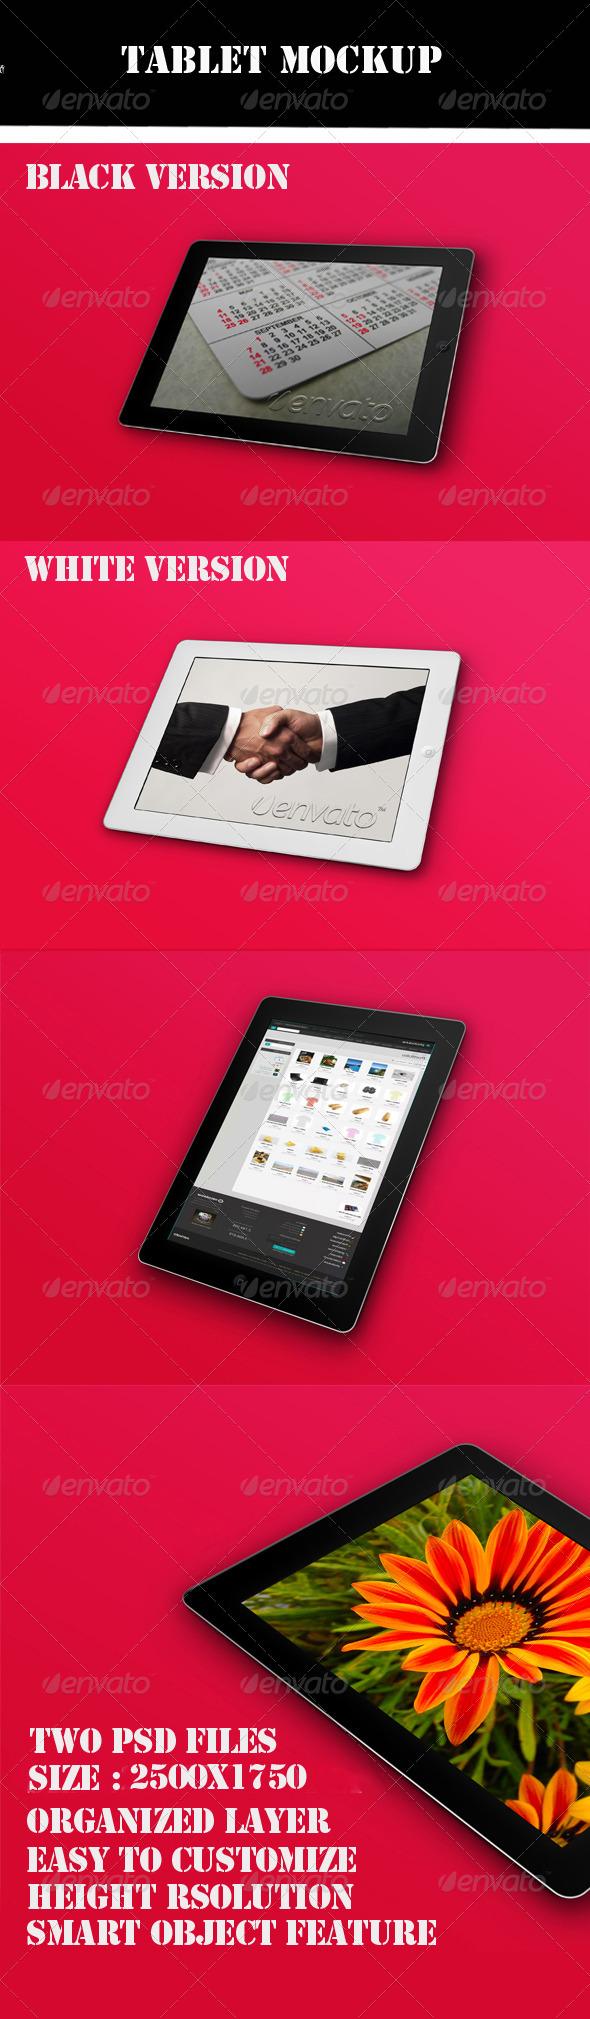 GraphicRiver Tablet Mockup 4870005